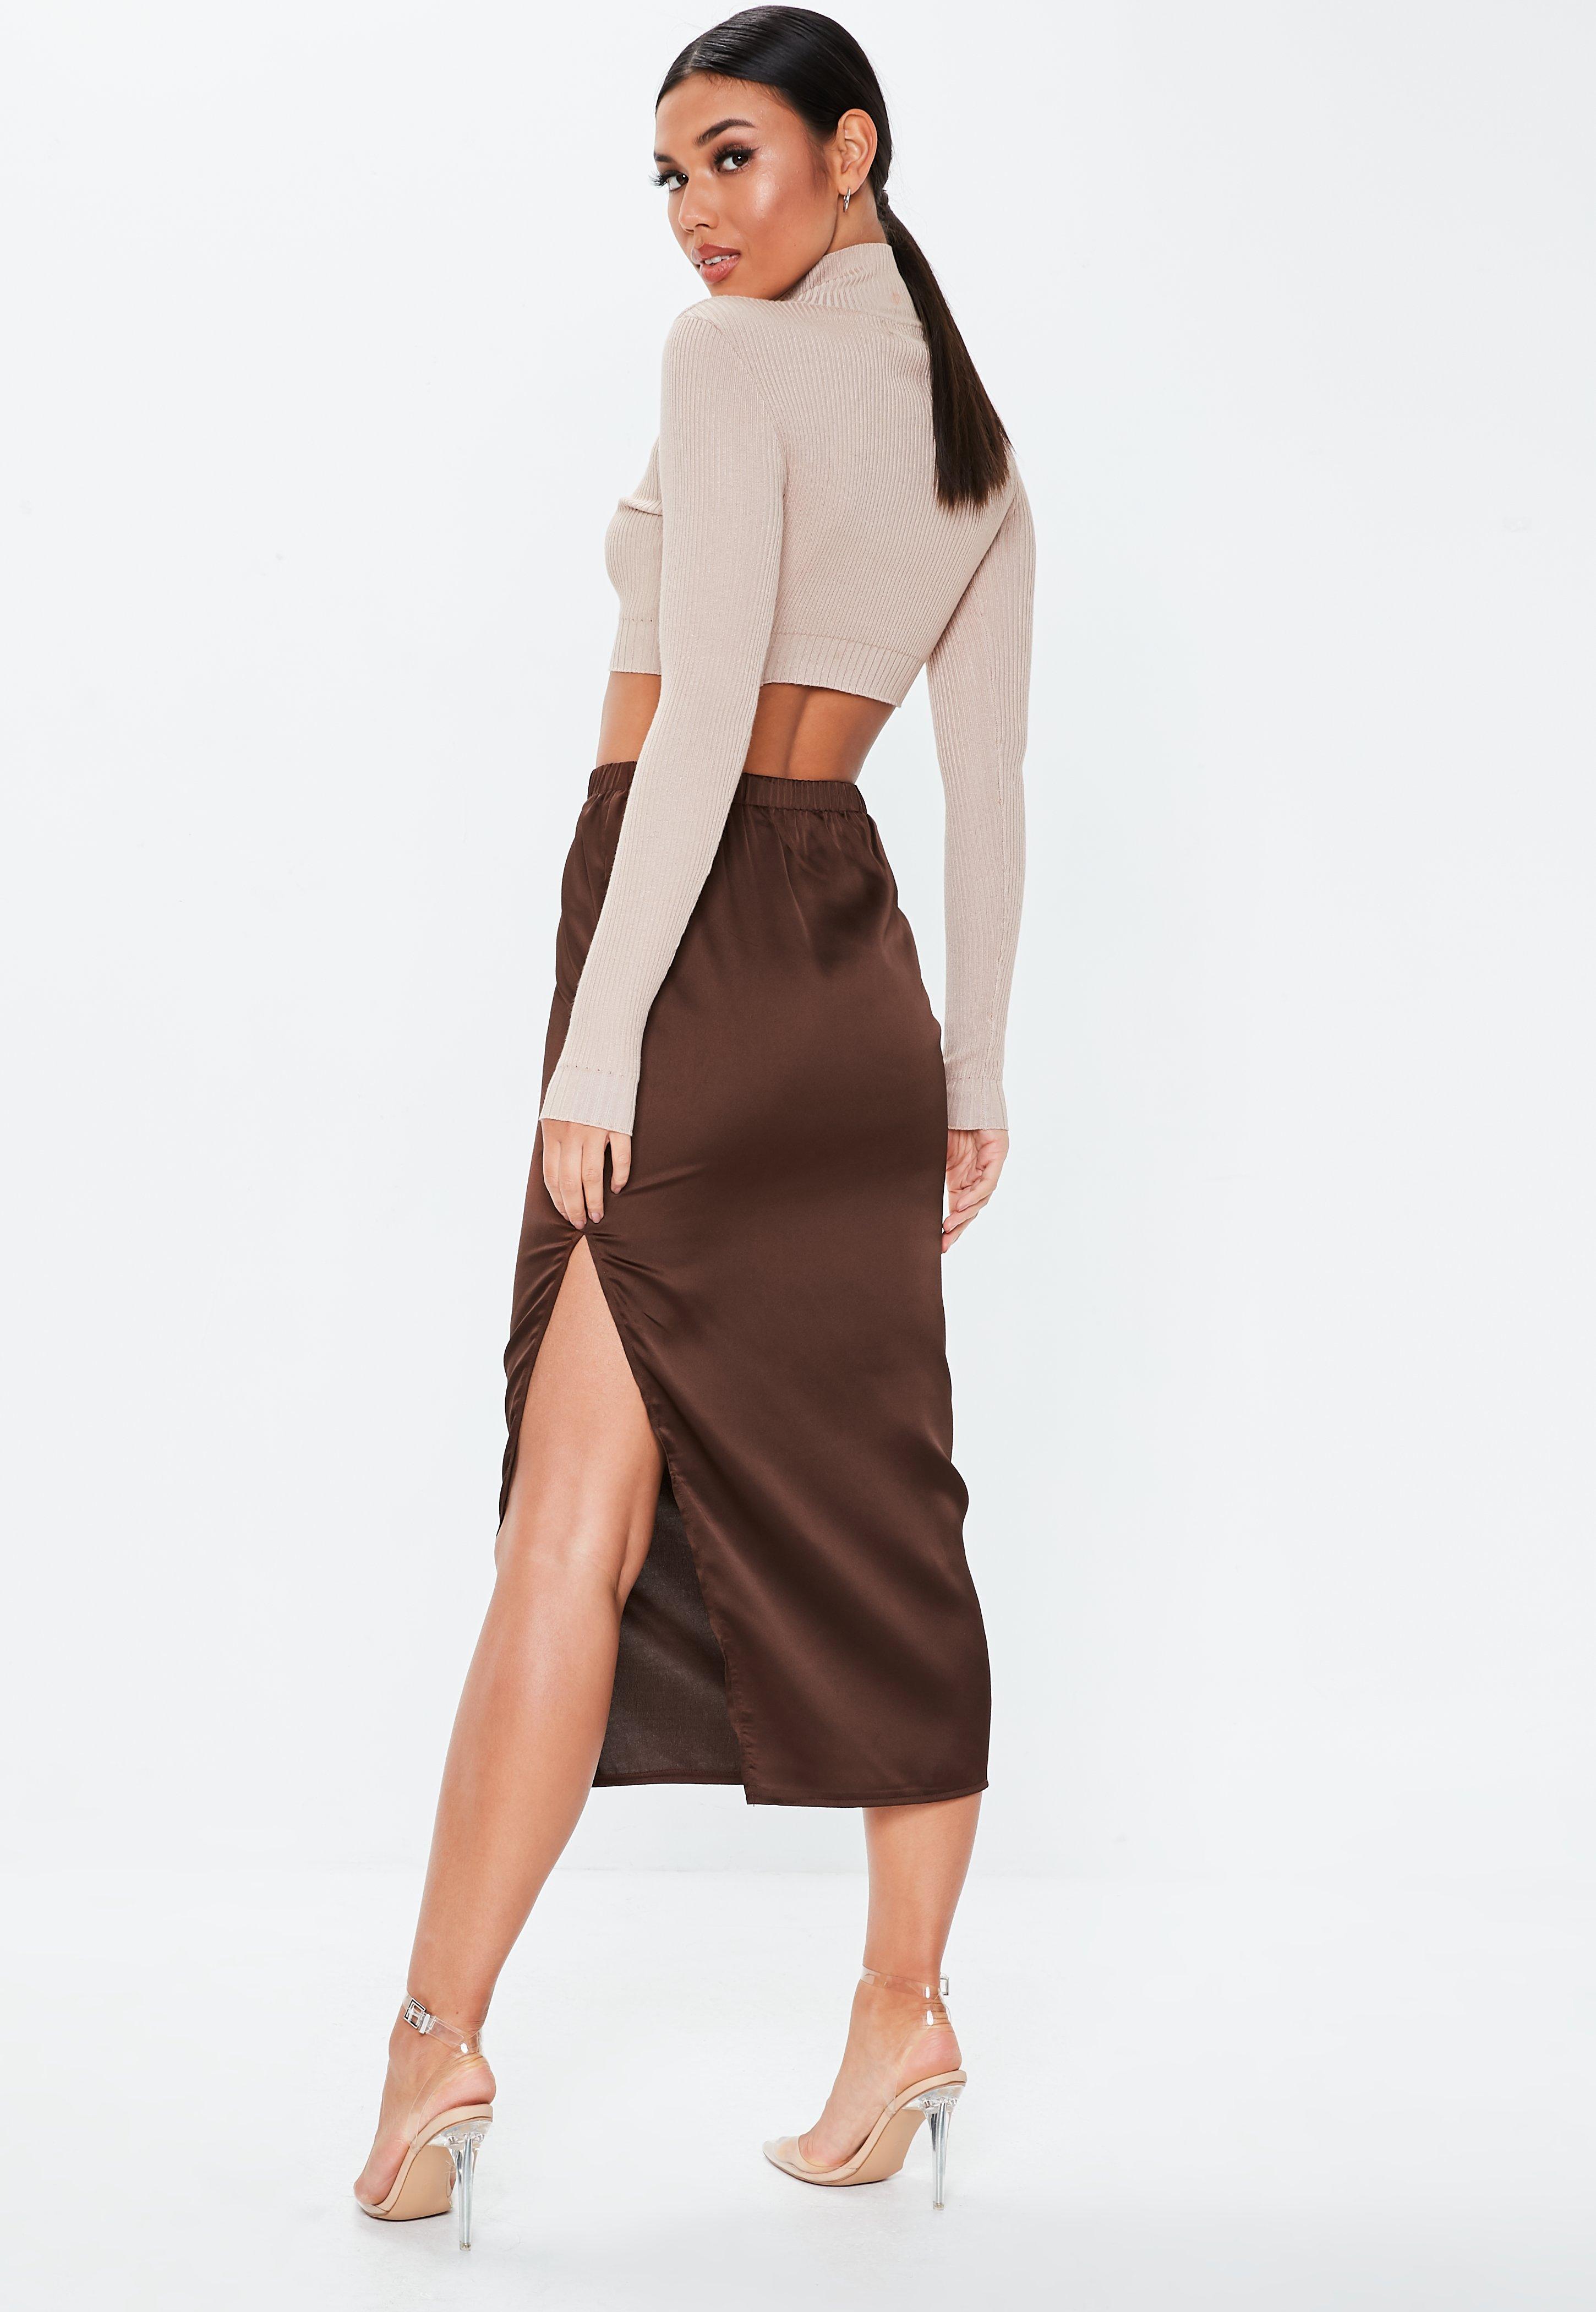 42a0cf9a561b Missguided - Brown Chocolate Satin Slip Midi Skirt - Lyst. View fullscreen